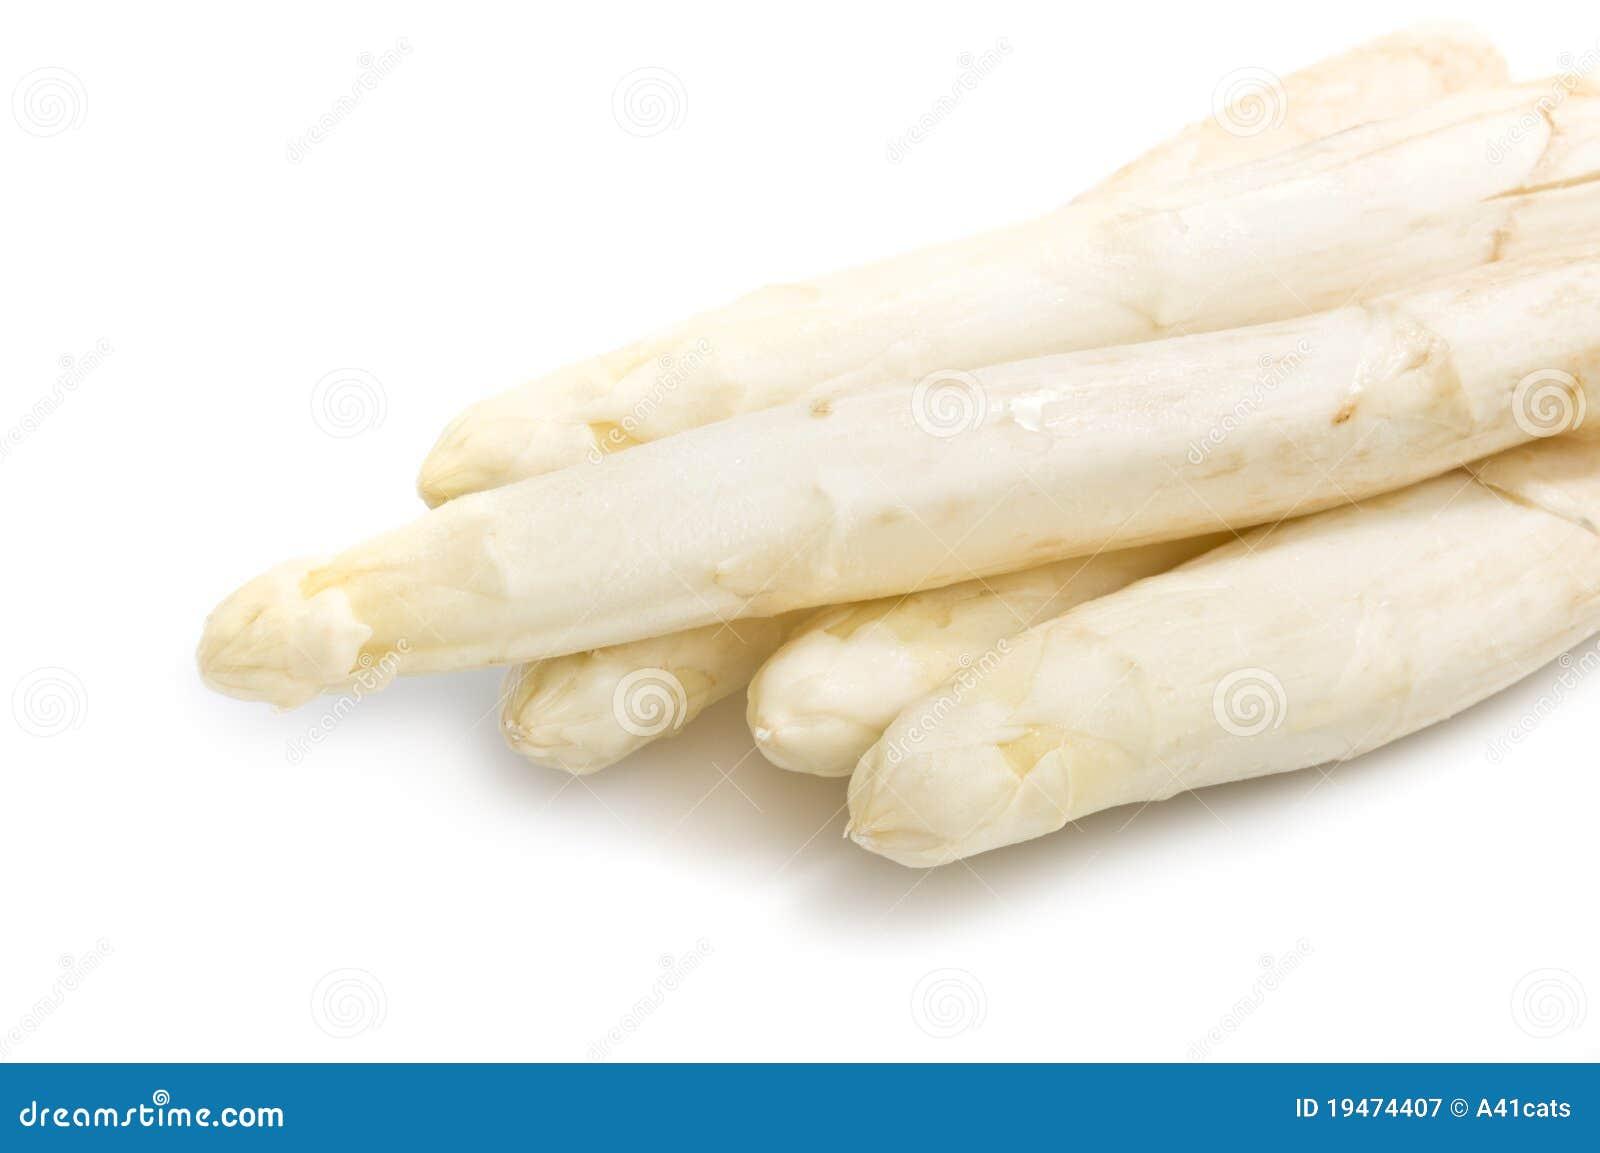 Download Beautiful White Jumbo Asparagus Close Up Shoot Stock Image - Image of freshness, stem: 19474407